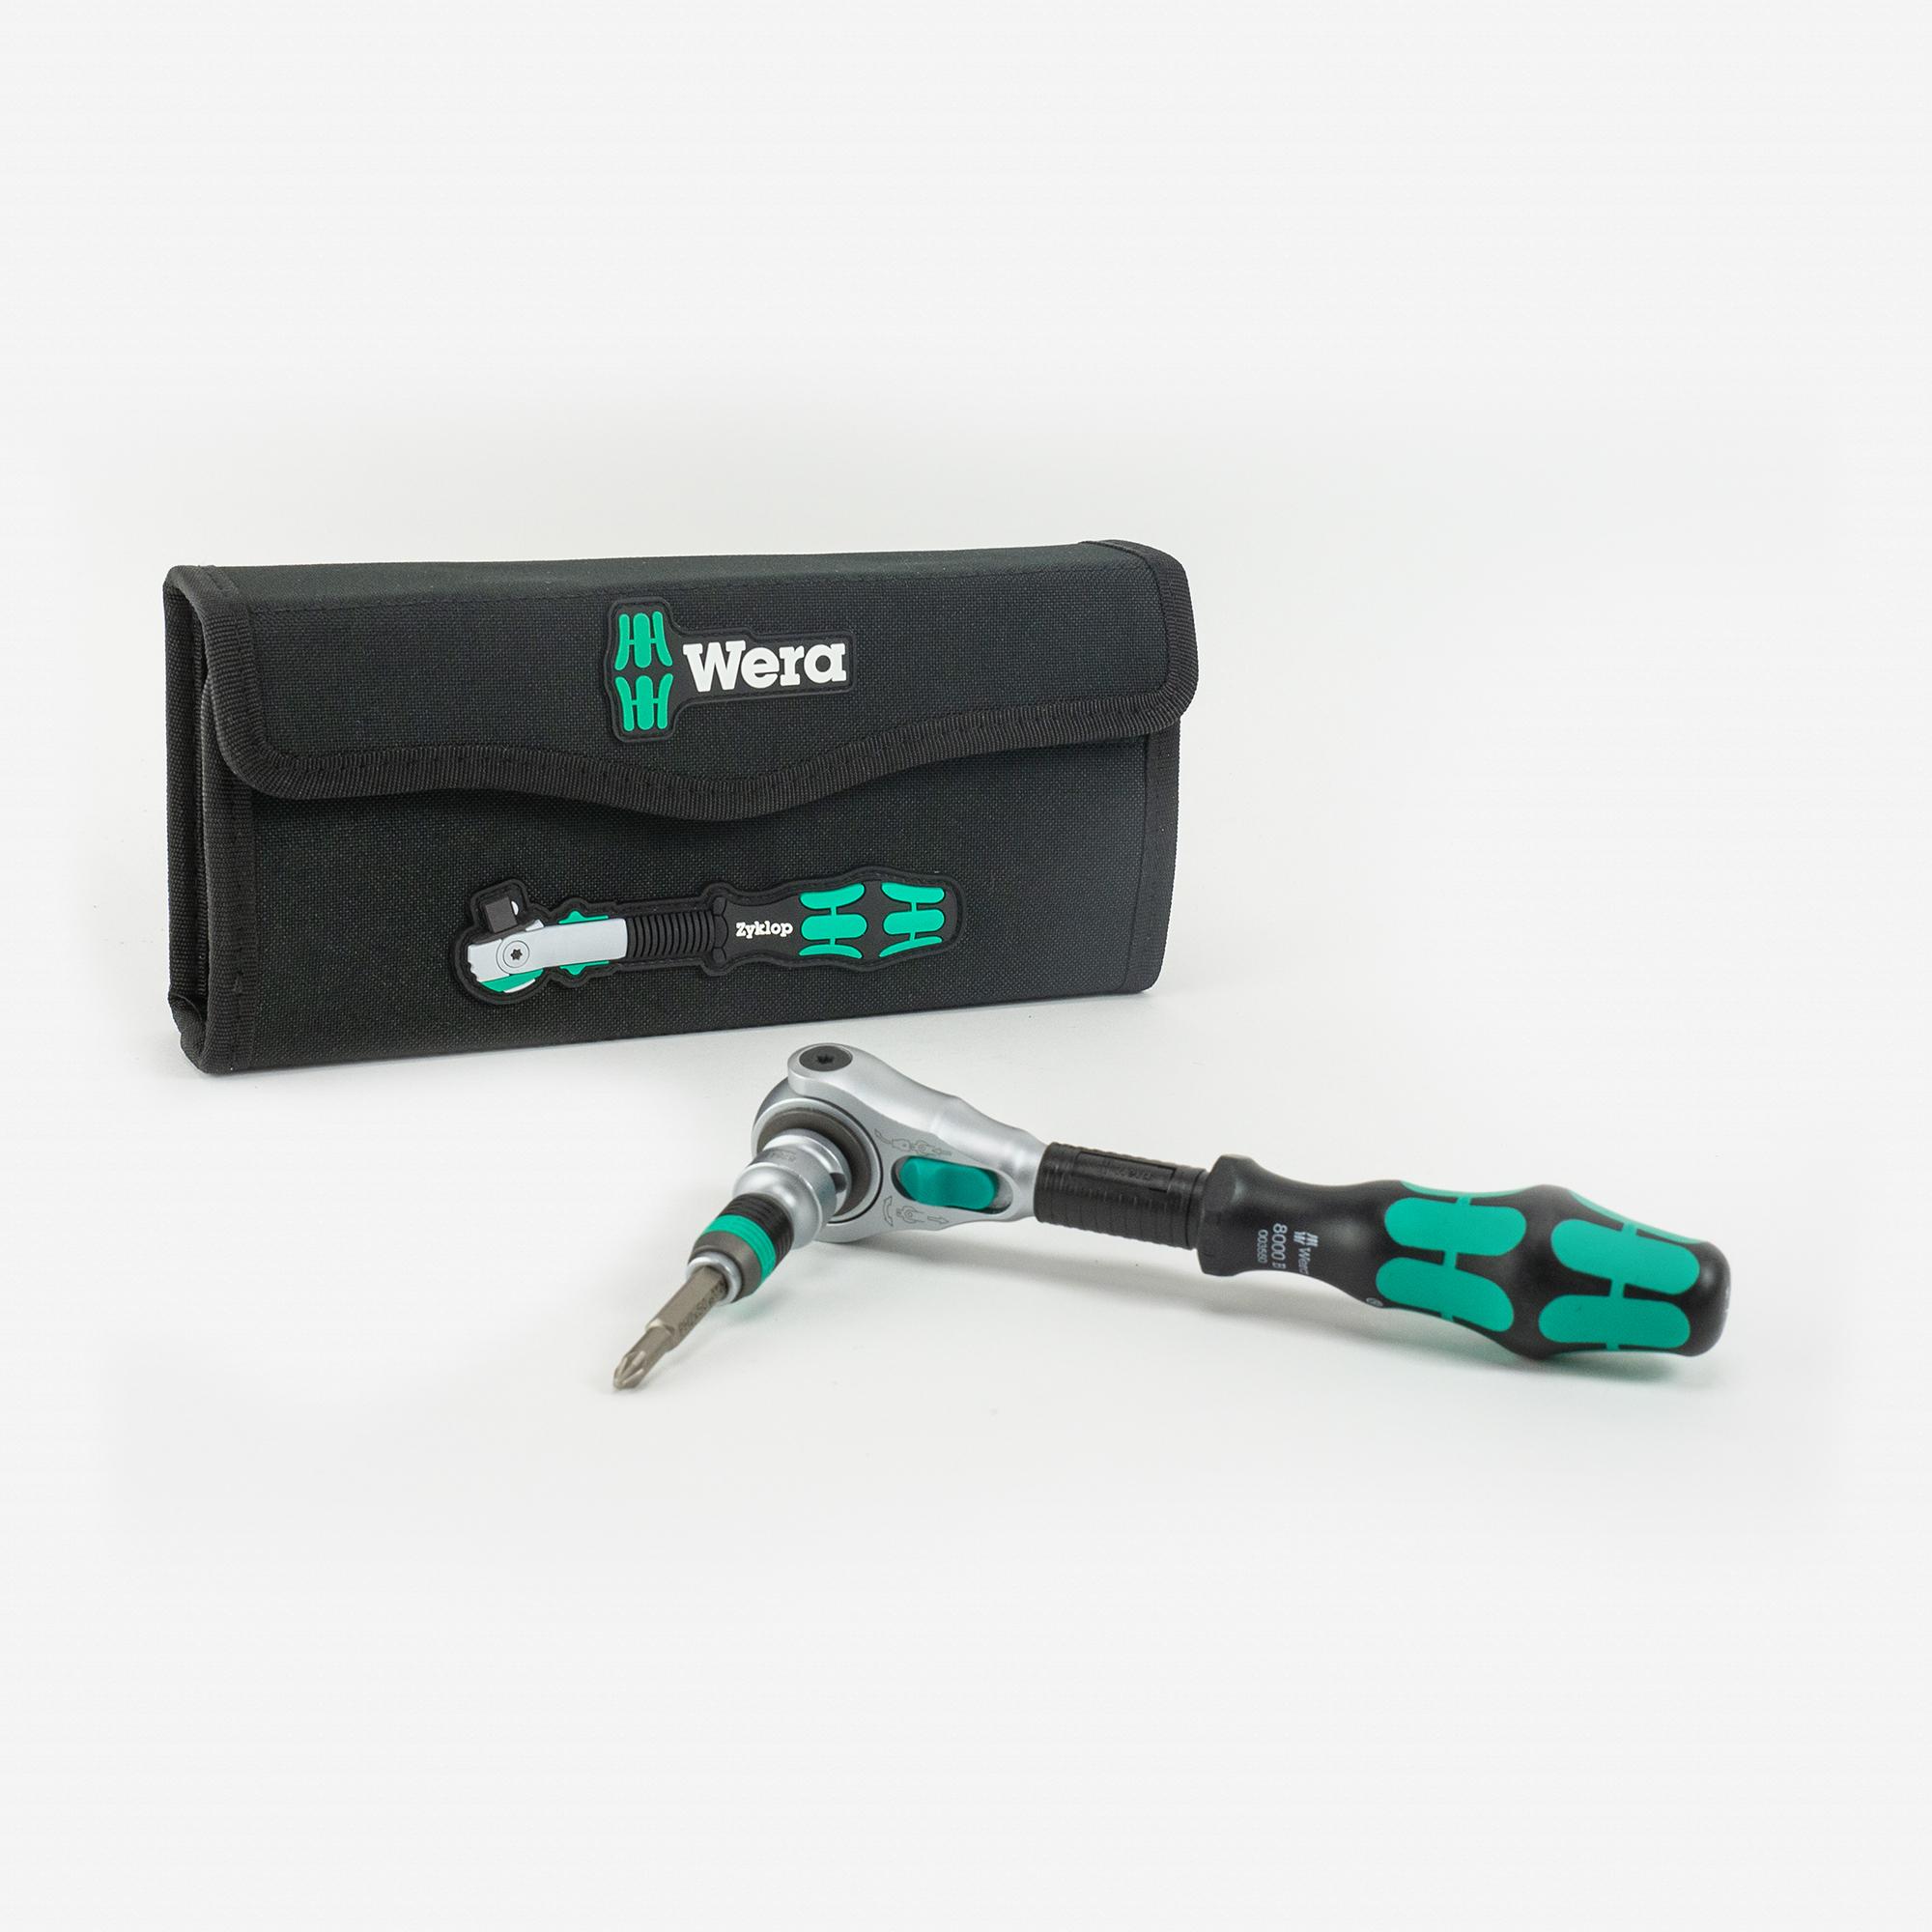 "Wera 004049 Zyklop Speed Ratchet 3/8"" Drive SAE Set - KC Tool"